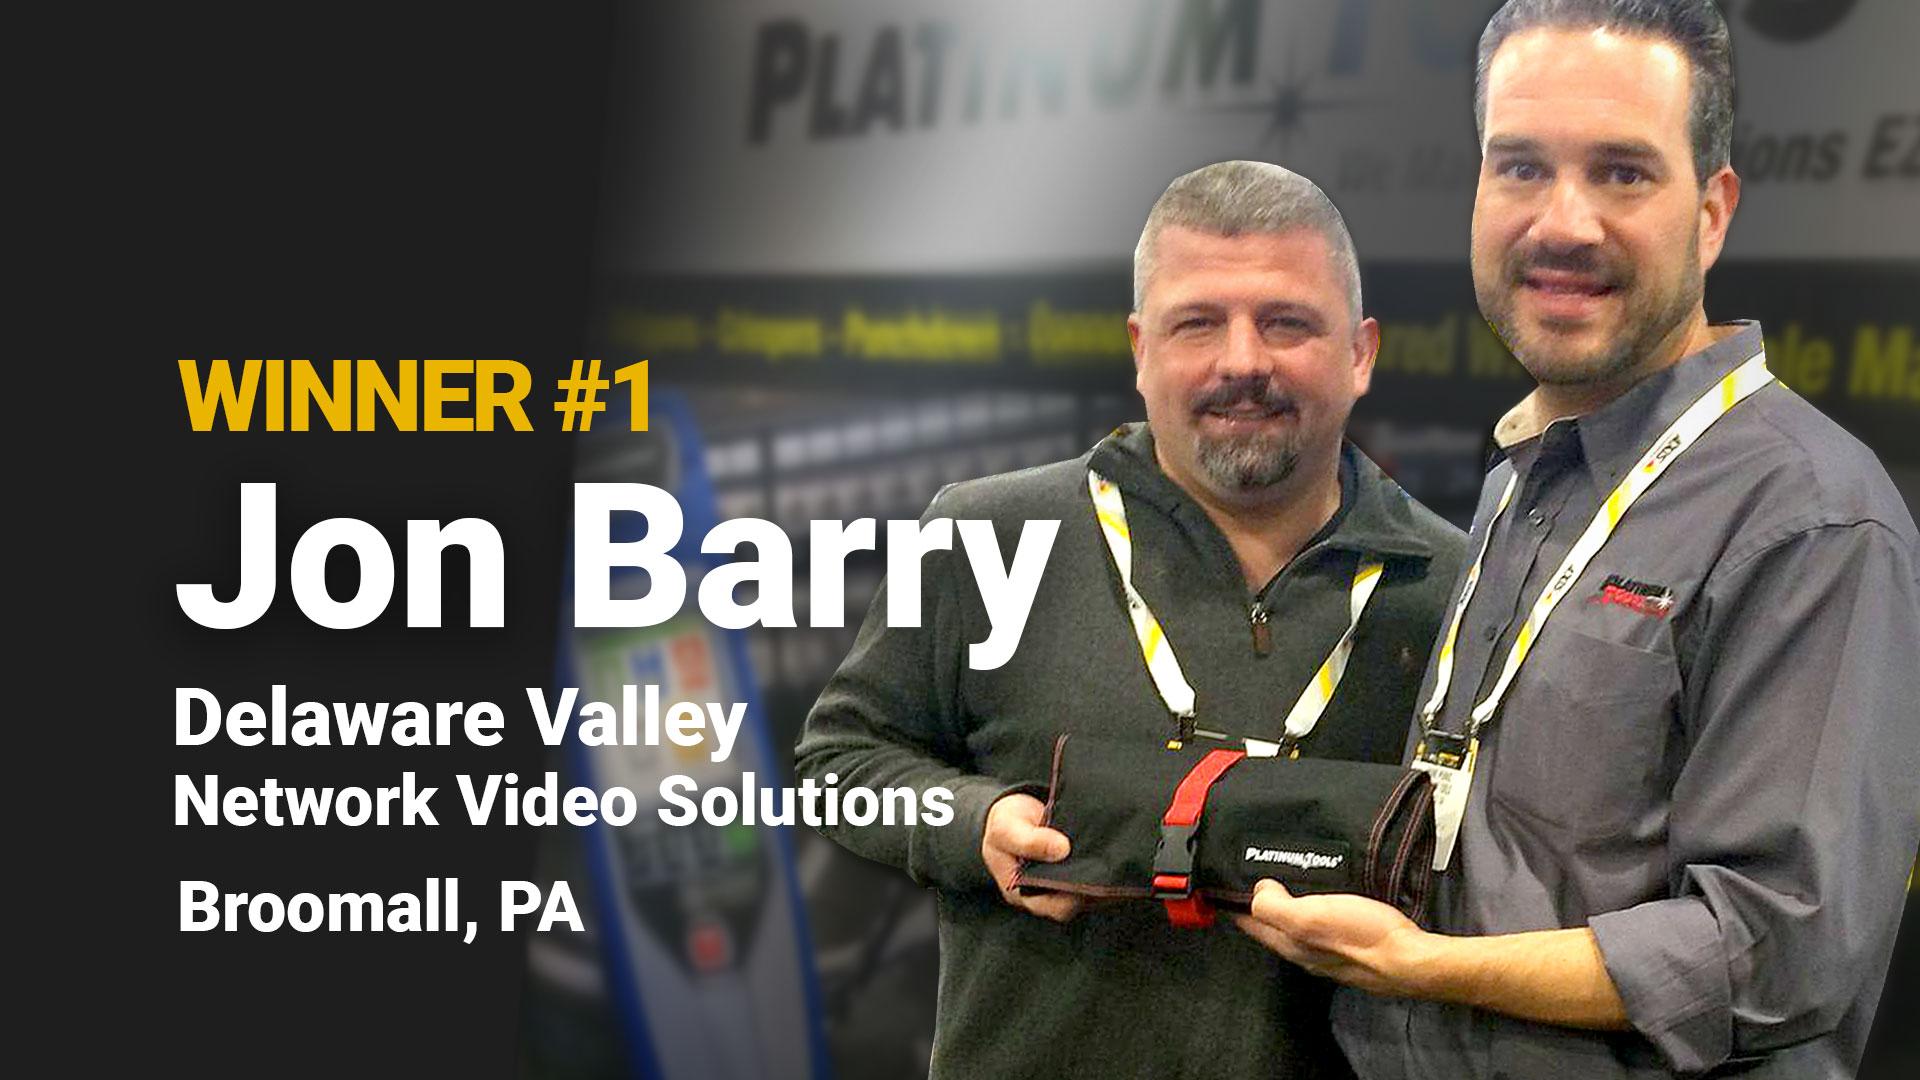 Jon Barry Delaware Valley Network Video Solutions